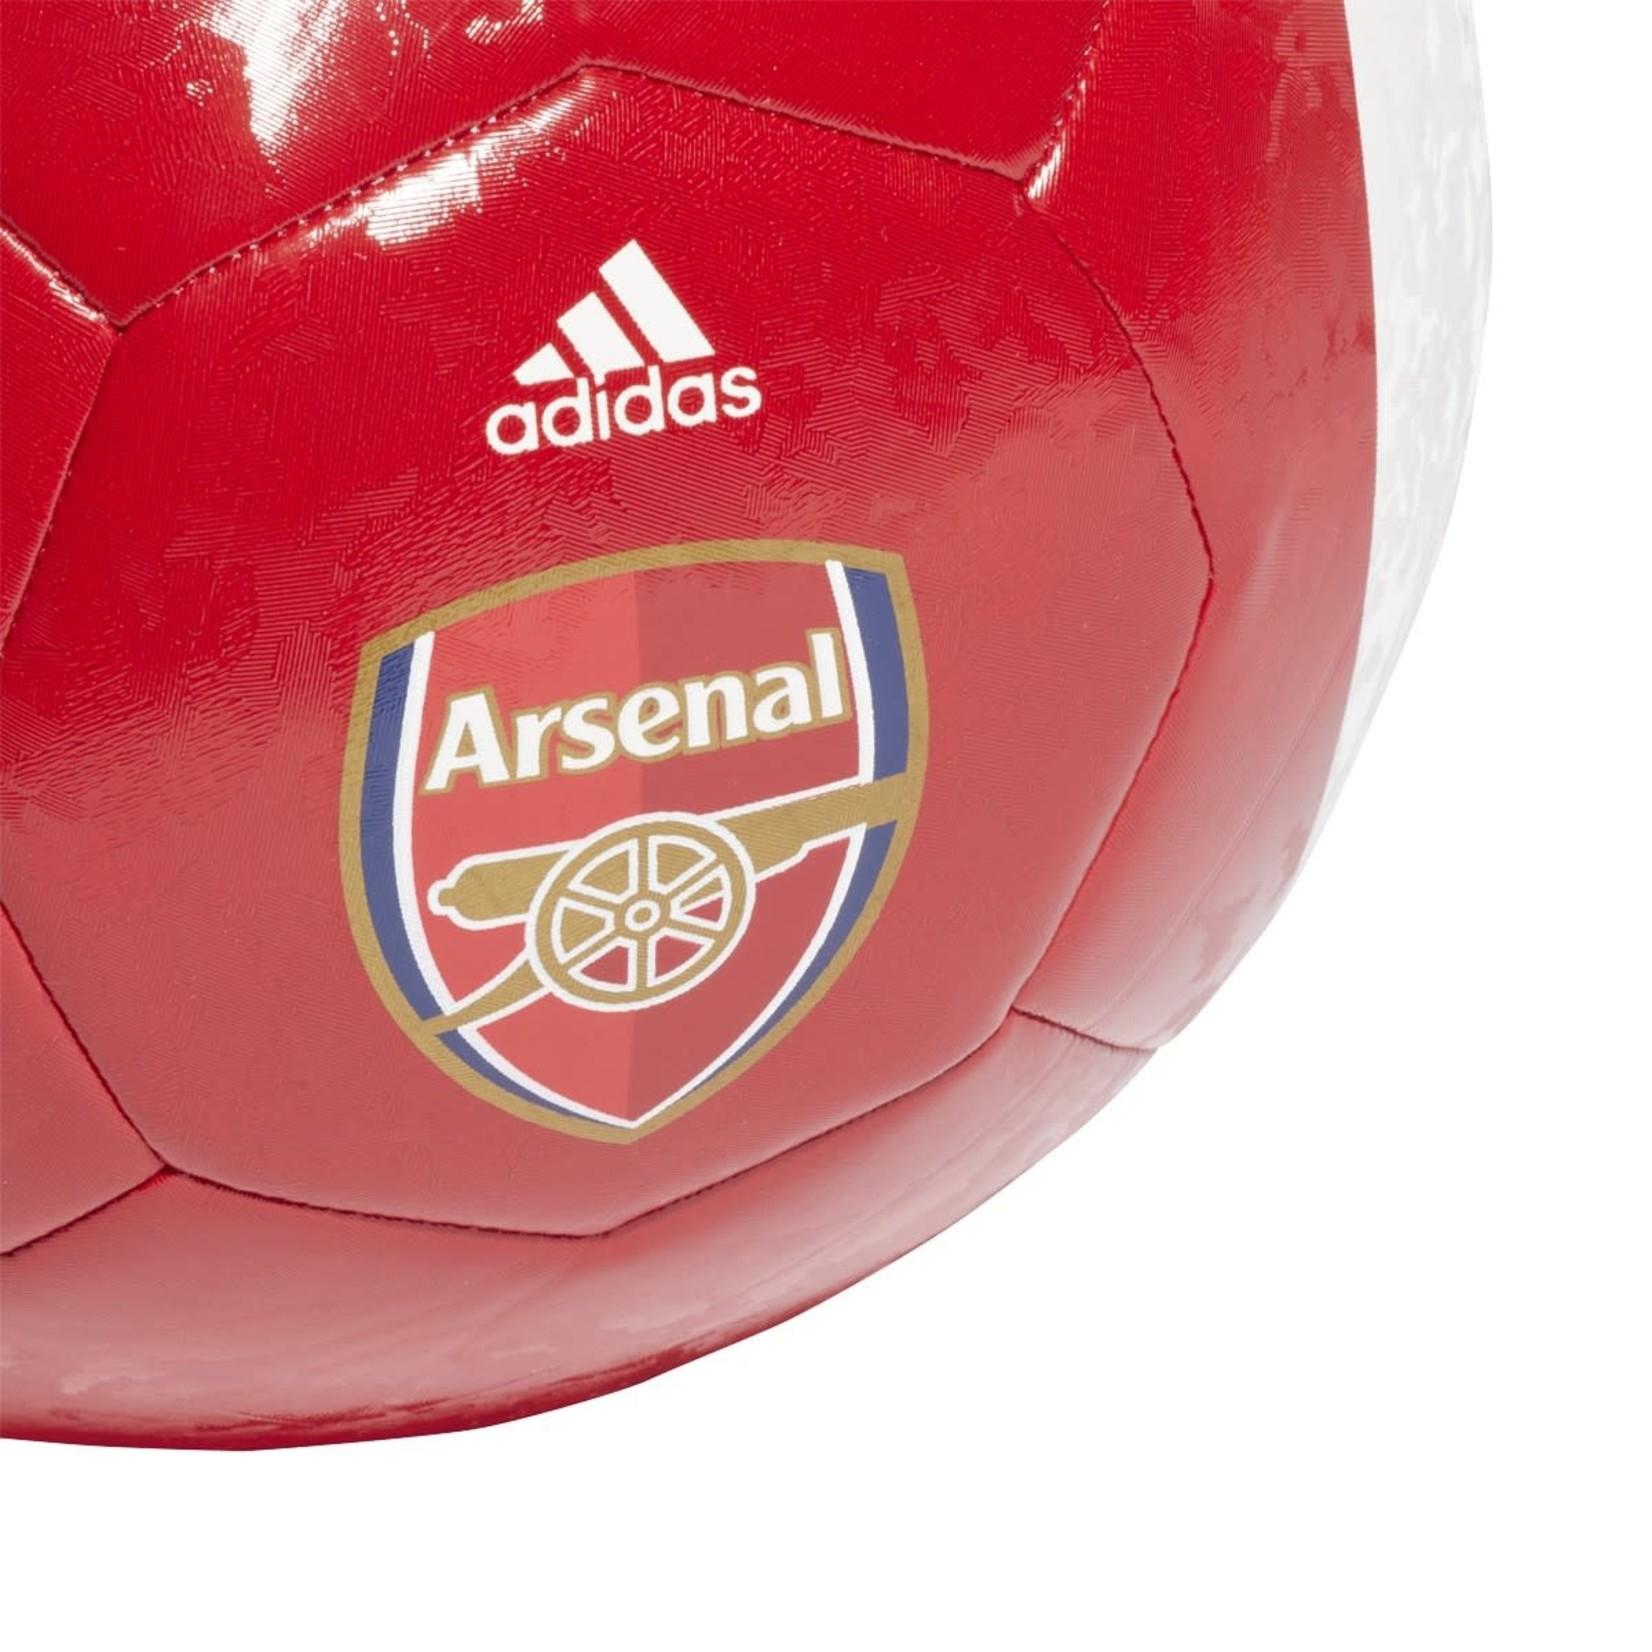 ADIDAS ARSENAL 21/22 HOME CLUB BALL (RED/WHITE)